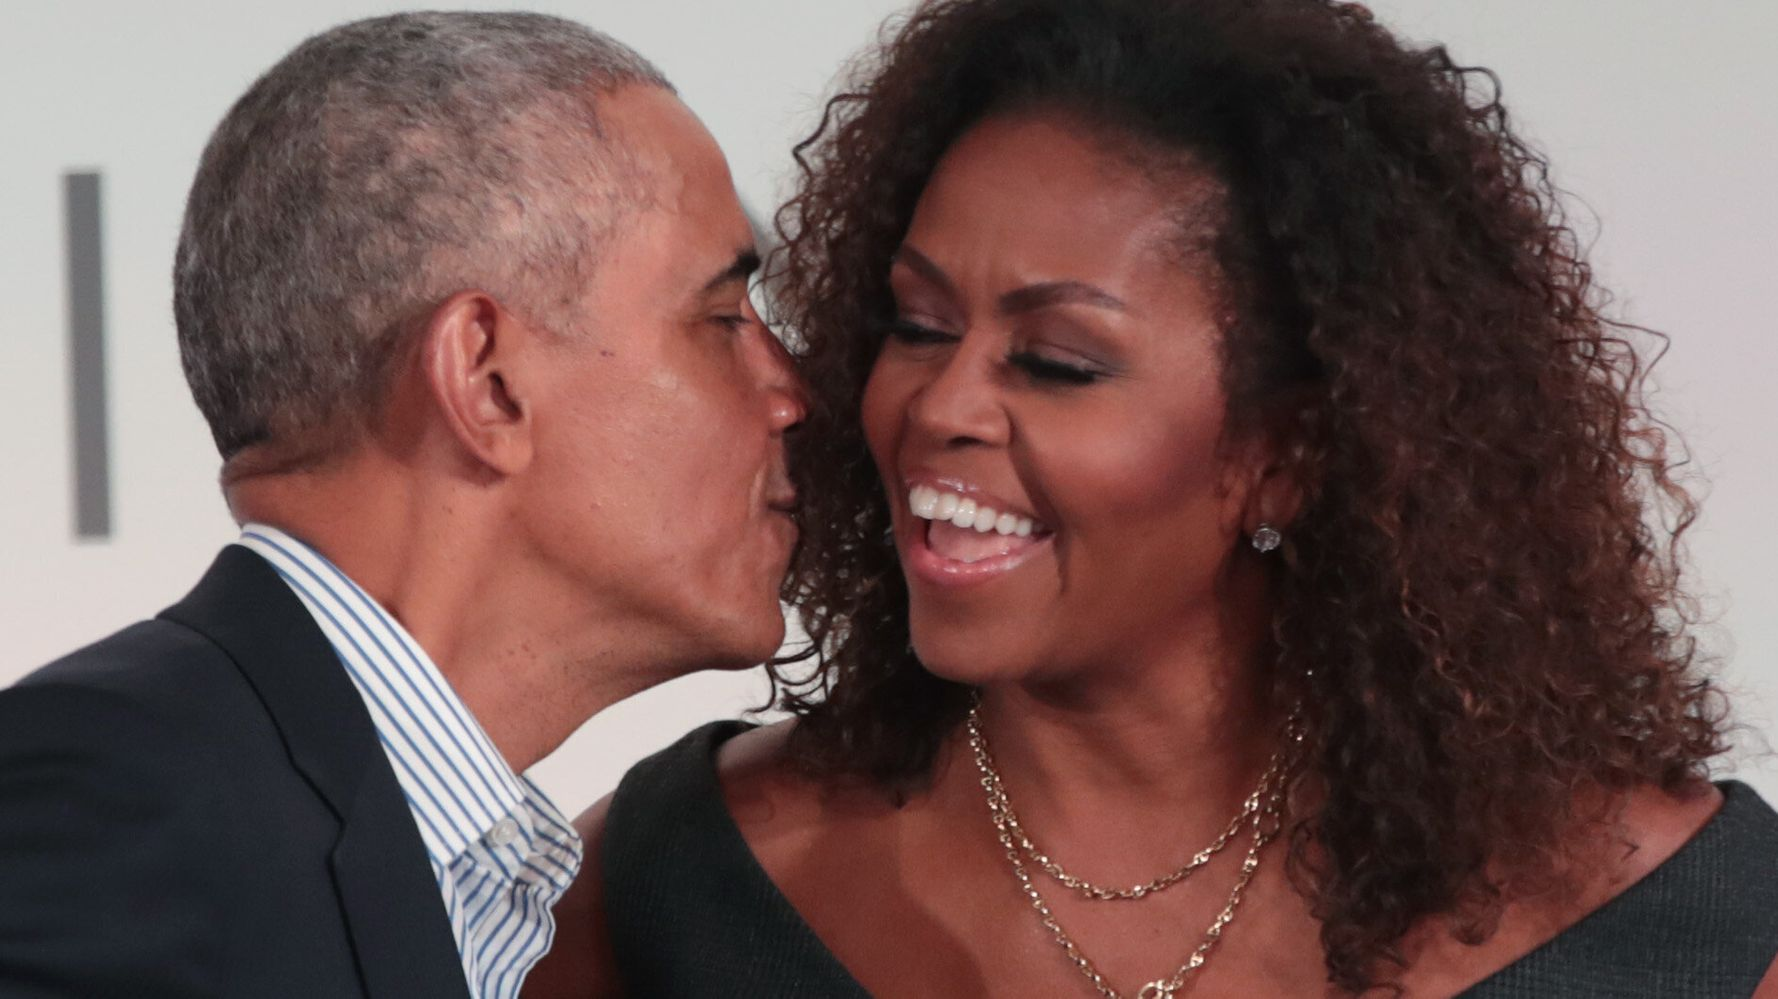 Michelle Obama Celebrates Barack Obama's Birthday With Sweet Throwback Family Snap